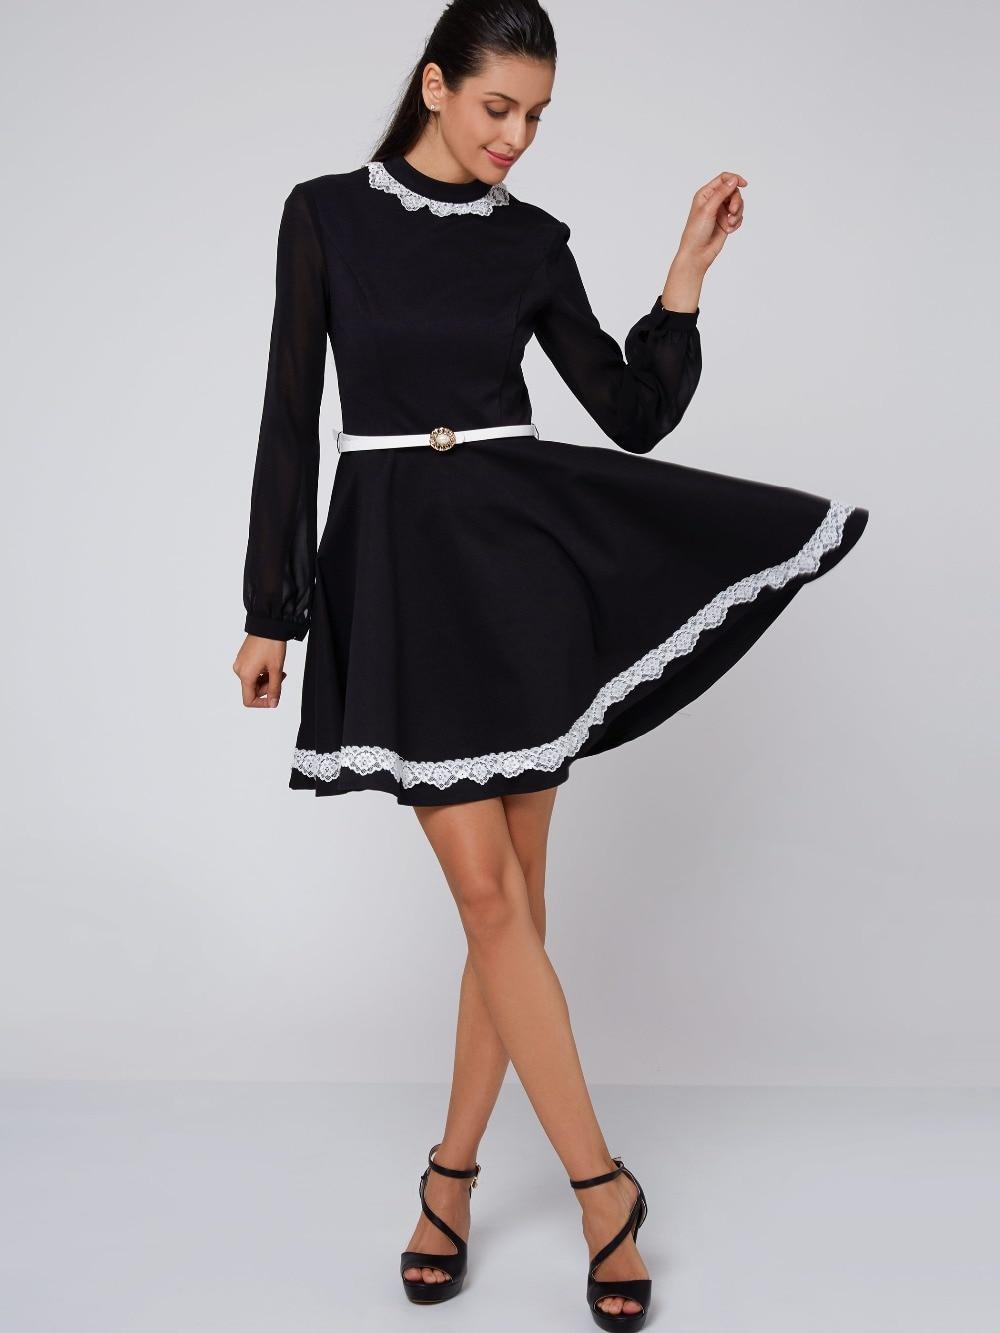 Long sleeve black dress cheap